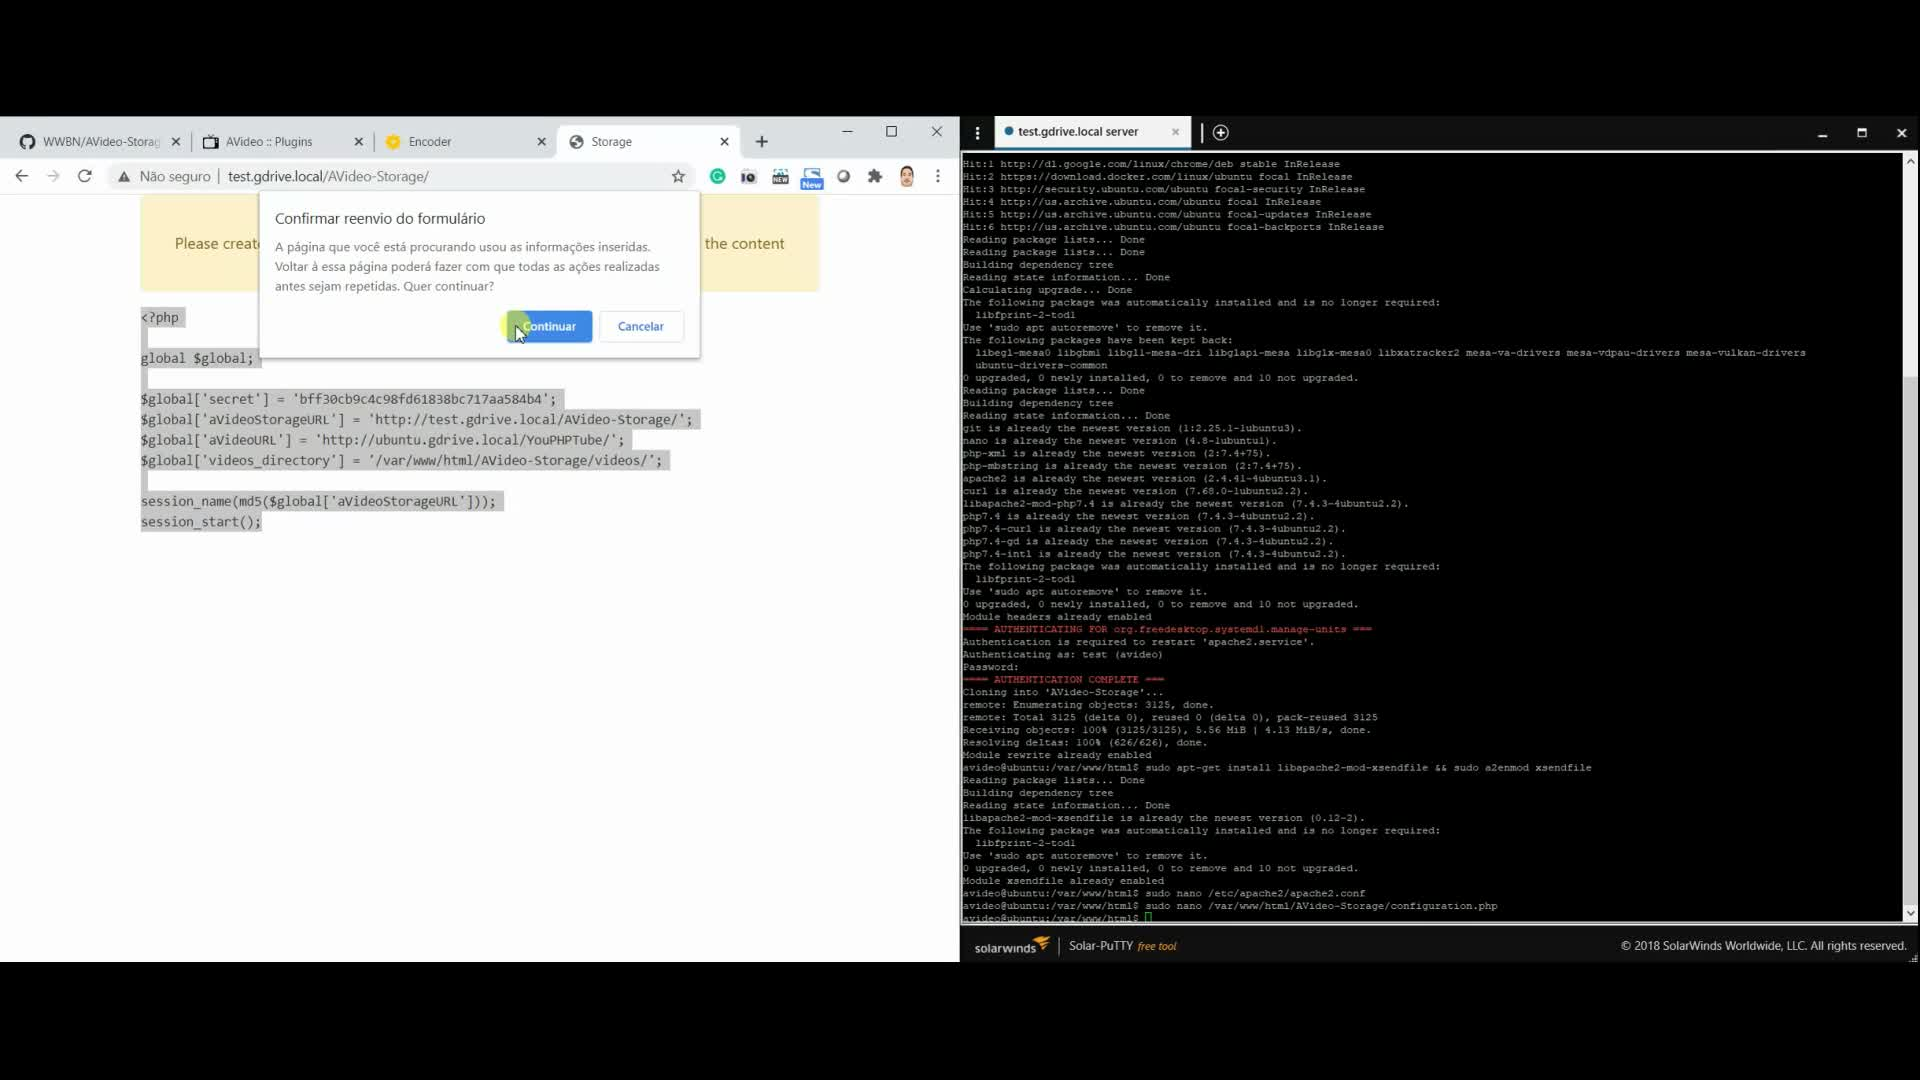 Installing YPTStorage and configuring the YPTStorage plugin